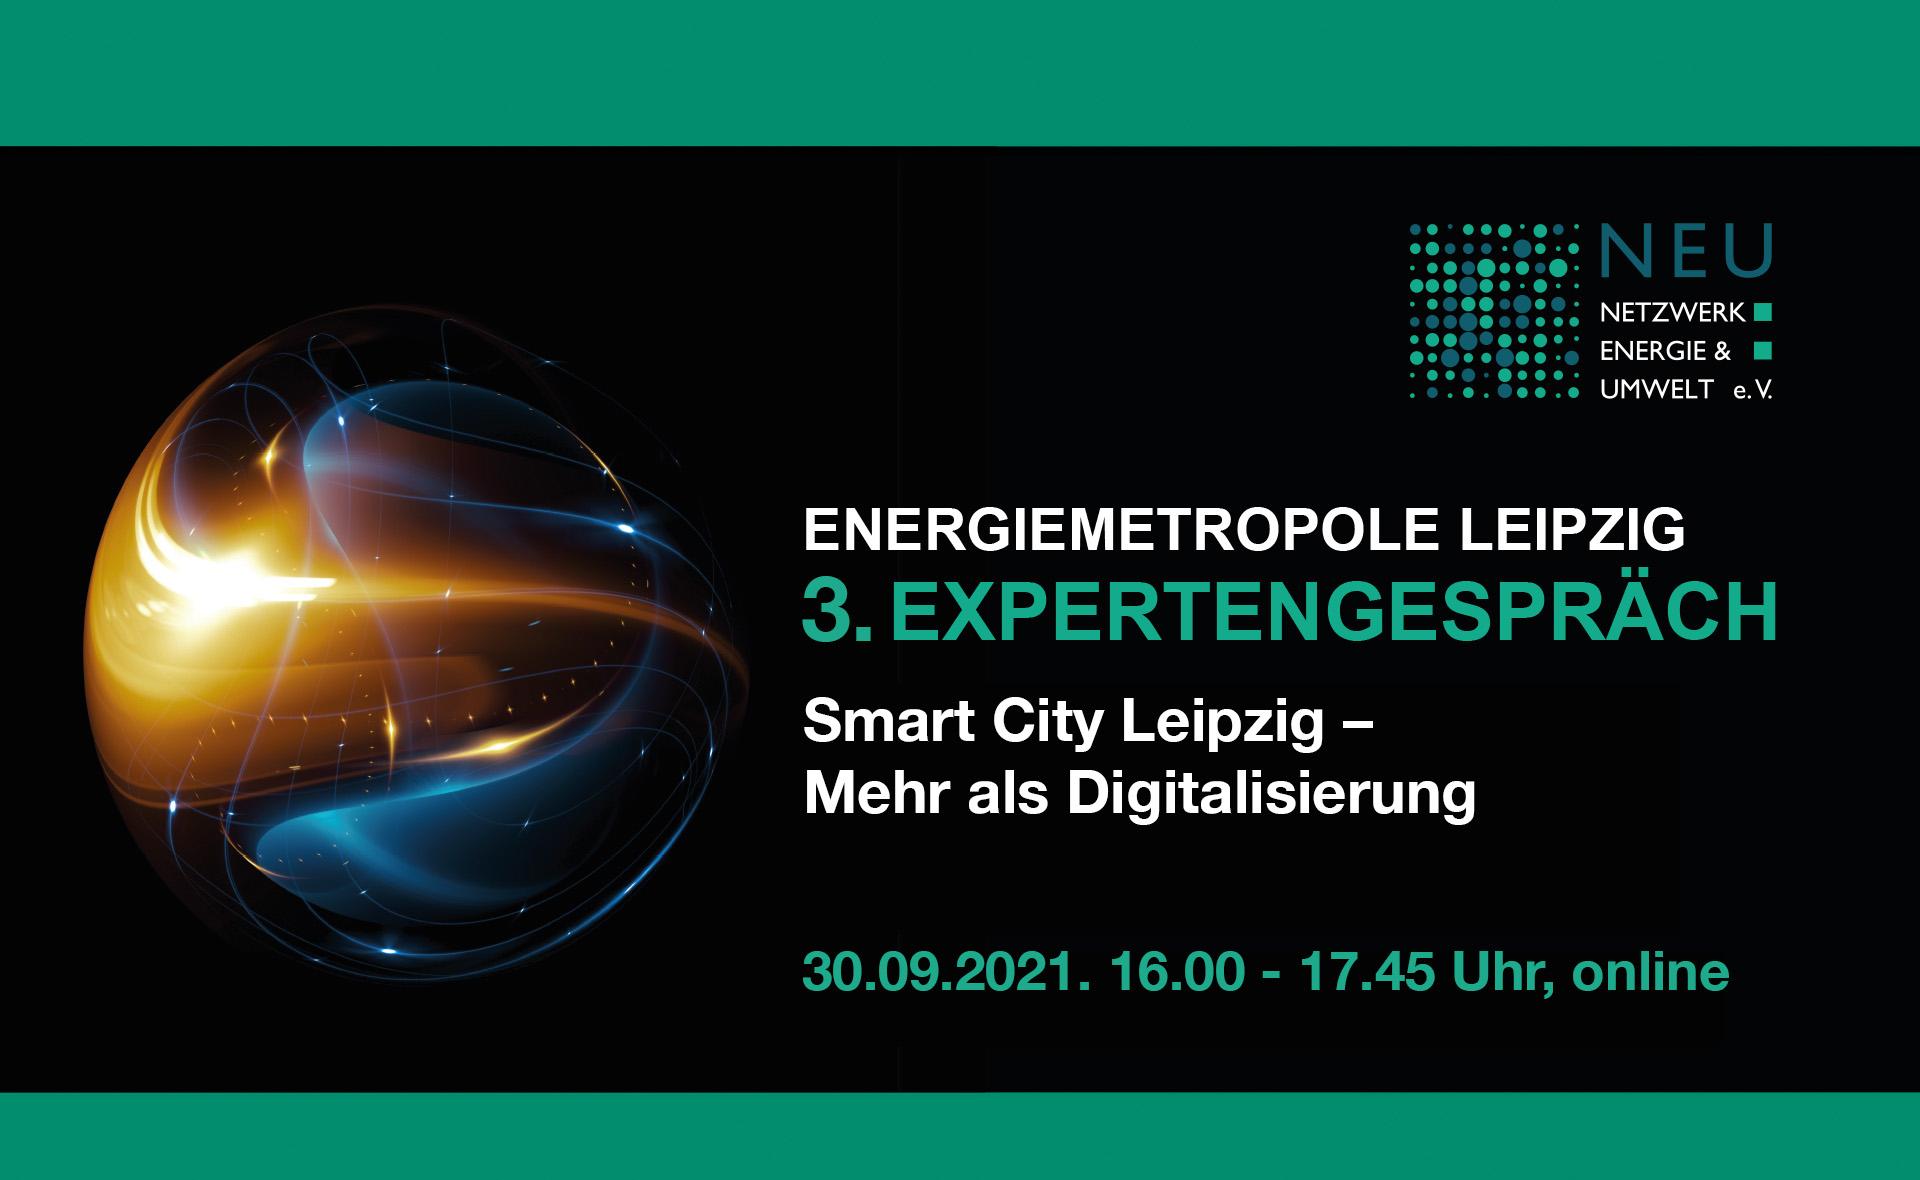 3. Expertengespräch - Smart City Leipzig